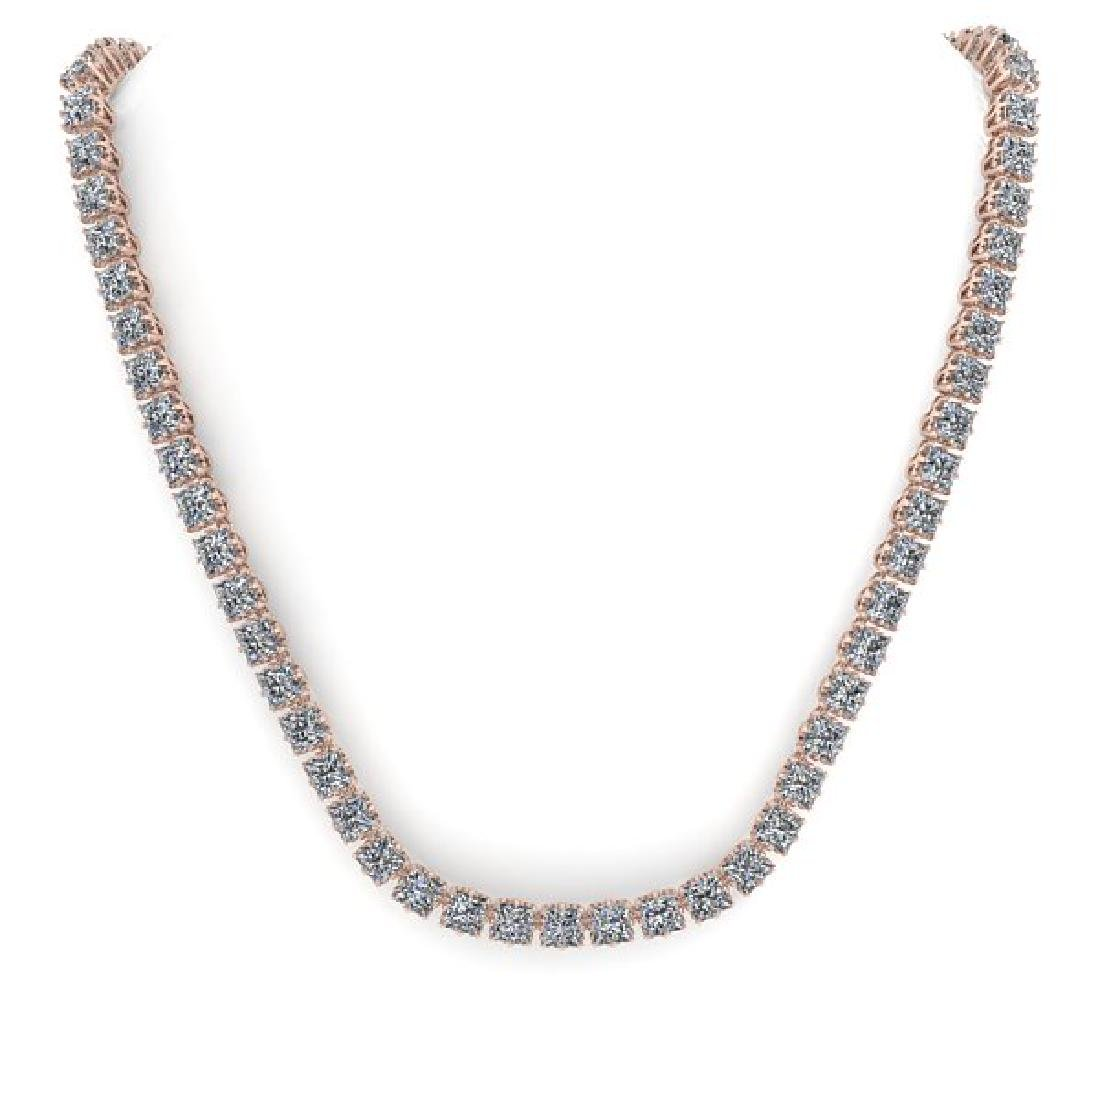 34 CTW Cushion Cut SI Certified Diamond Necklace 14K - 3